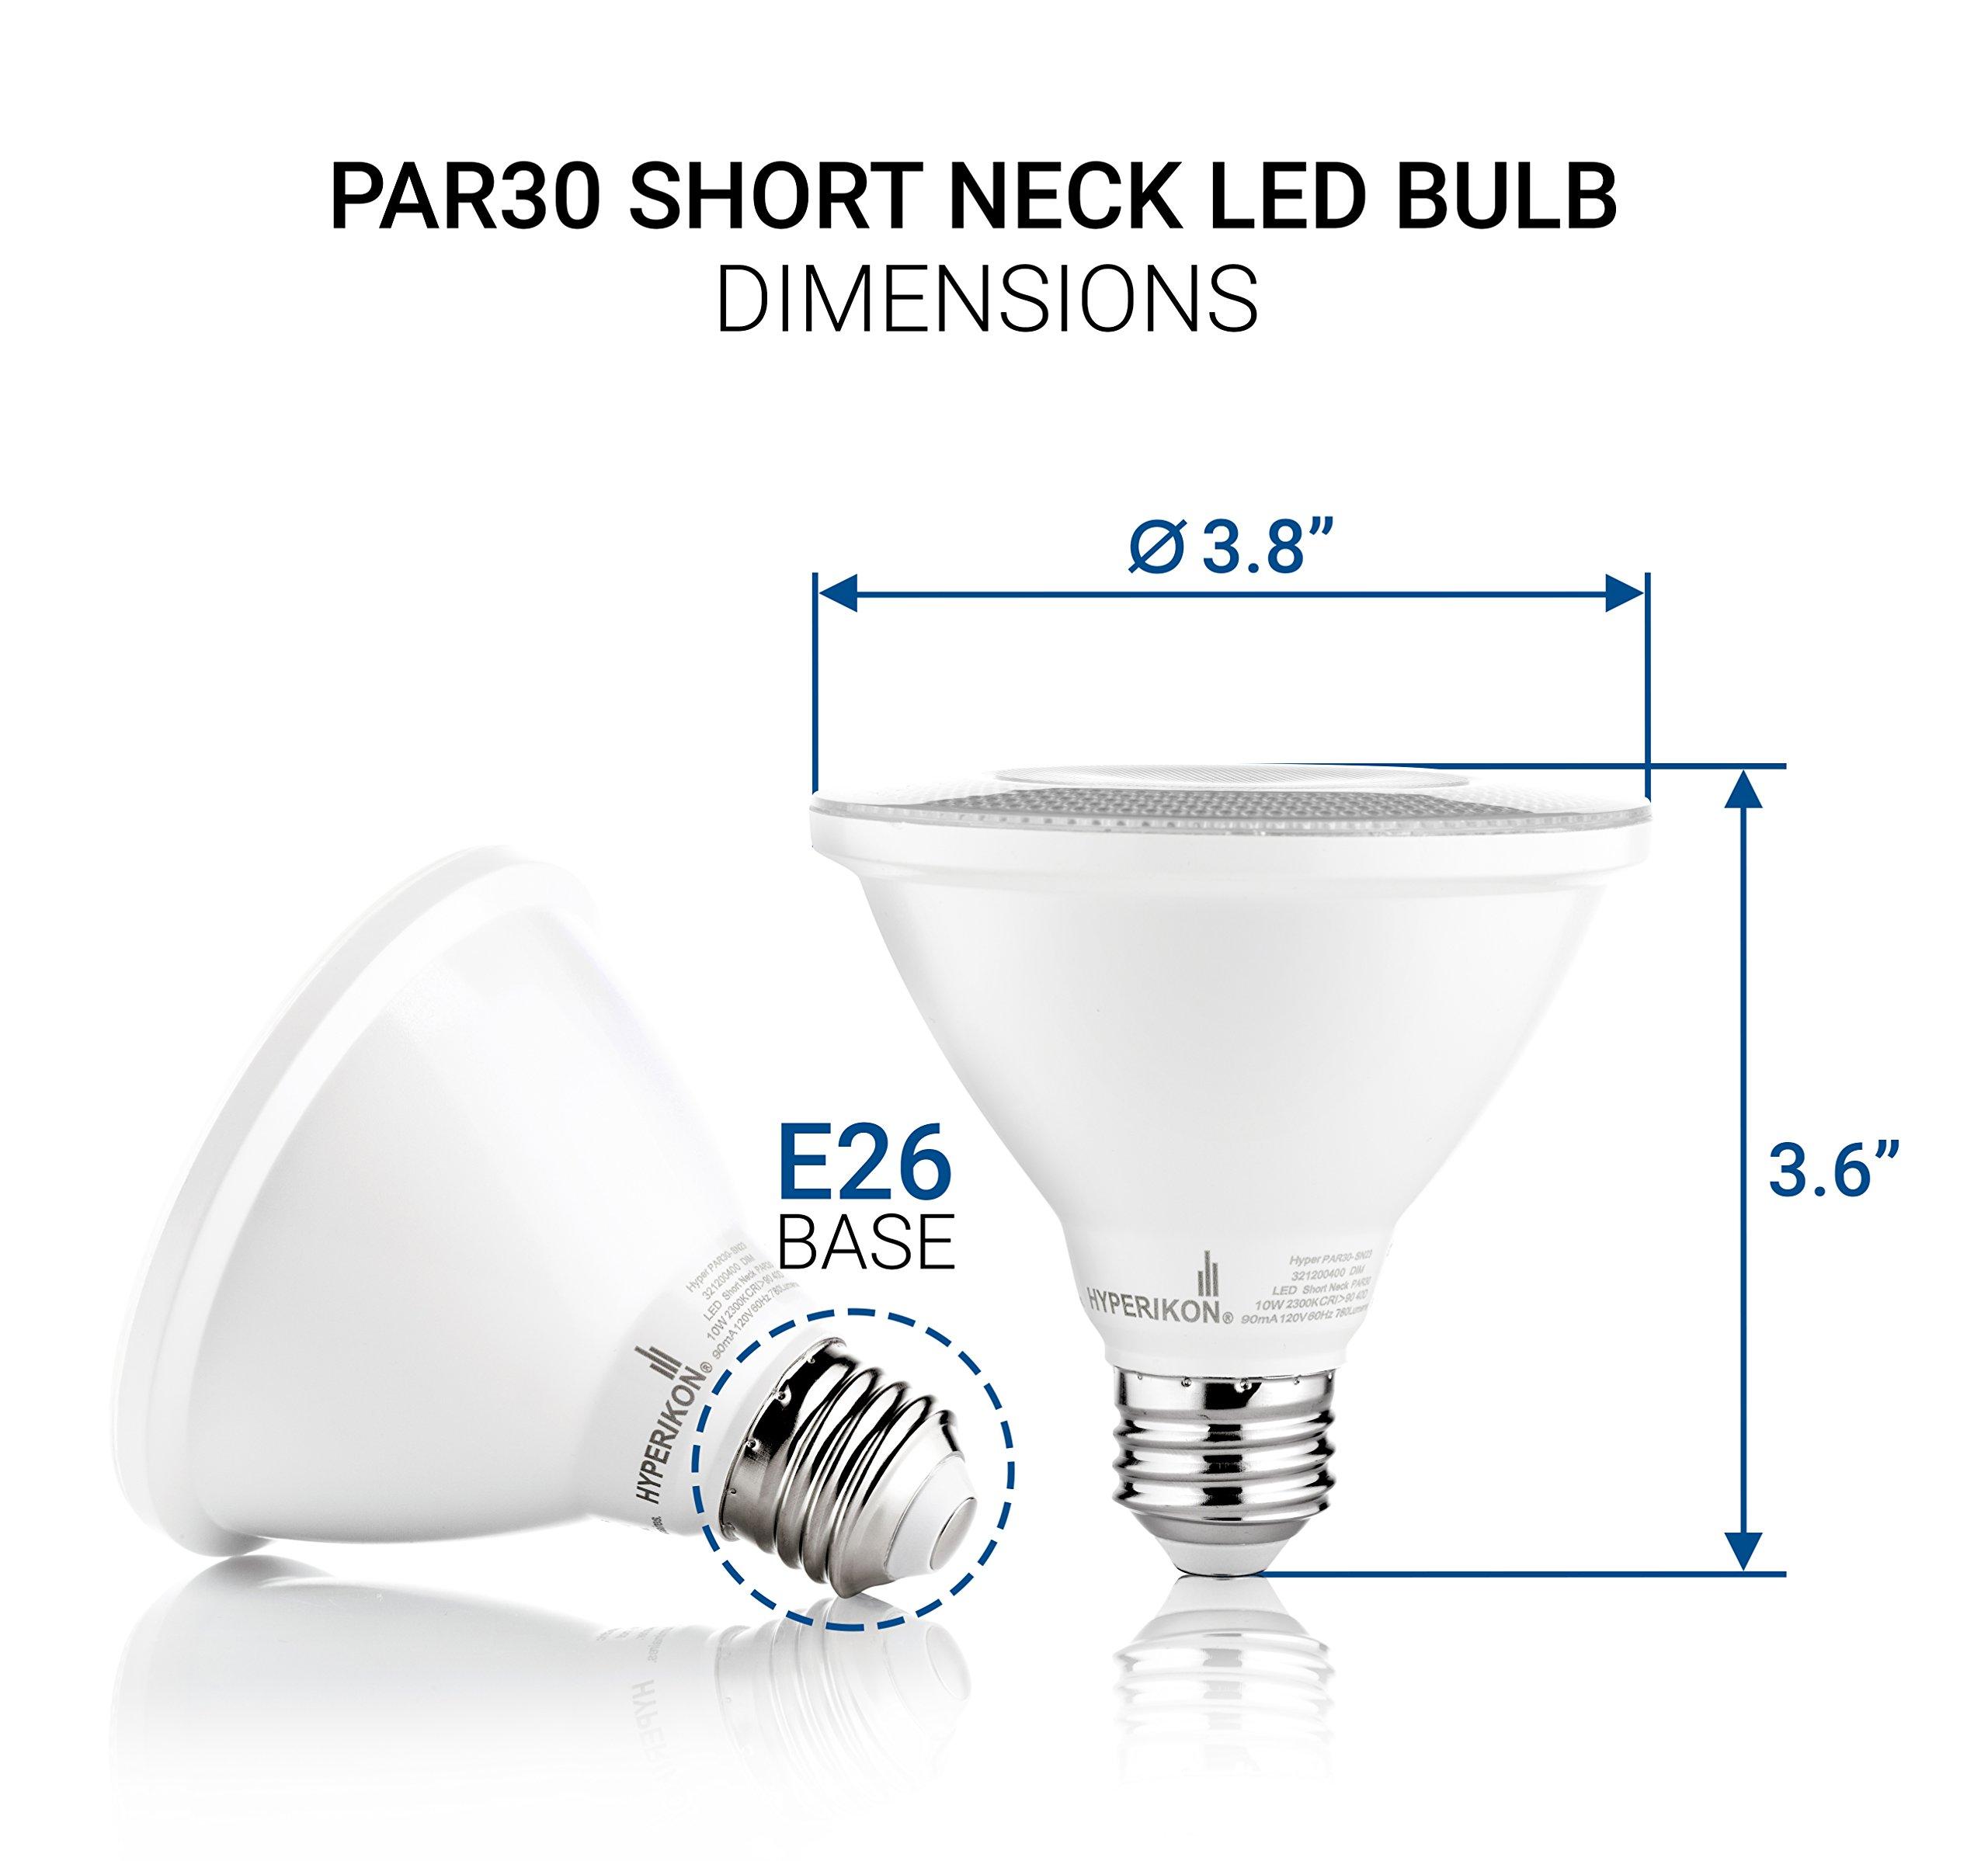 Hyperikon PAR30 Short Neck LED Bulb, Dimmable, 10W (65W Equivalent), 4000K (Daylight Glow) 840 lm, CRI 90+, Flood Bulb, Medium Base (E26), UL & Energy Star - Great for Work Areas, Kitchen (6 Pack) by Hyperikon (Image #6)